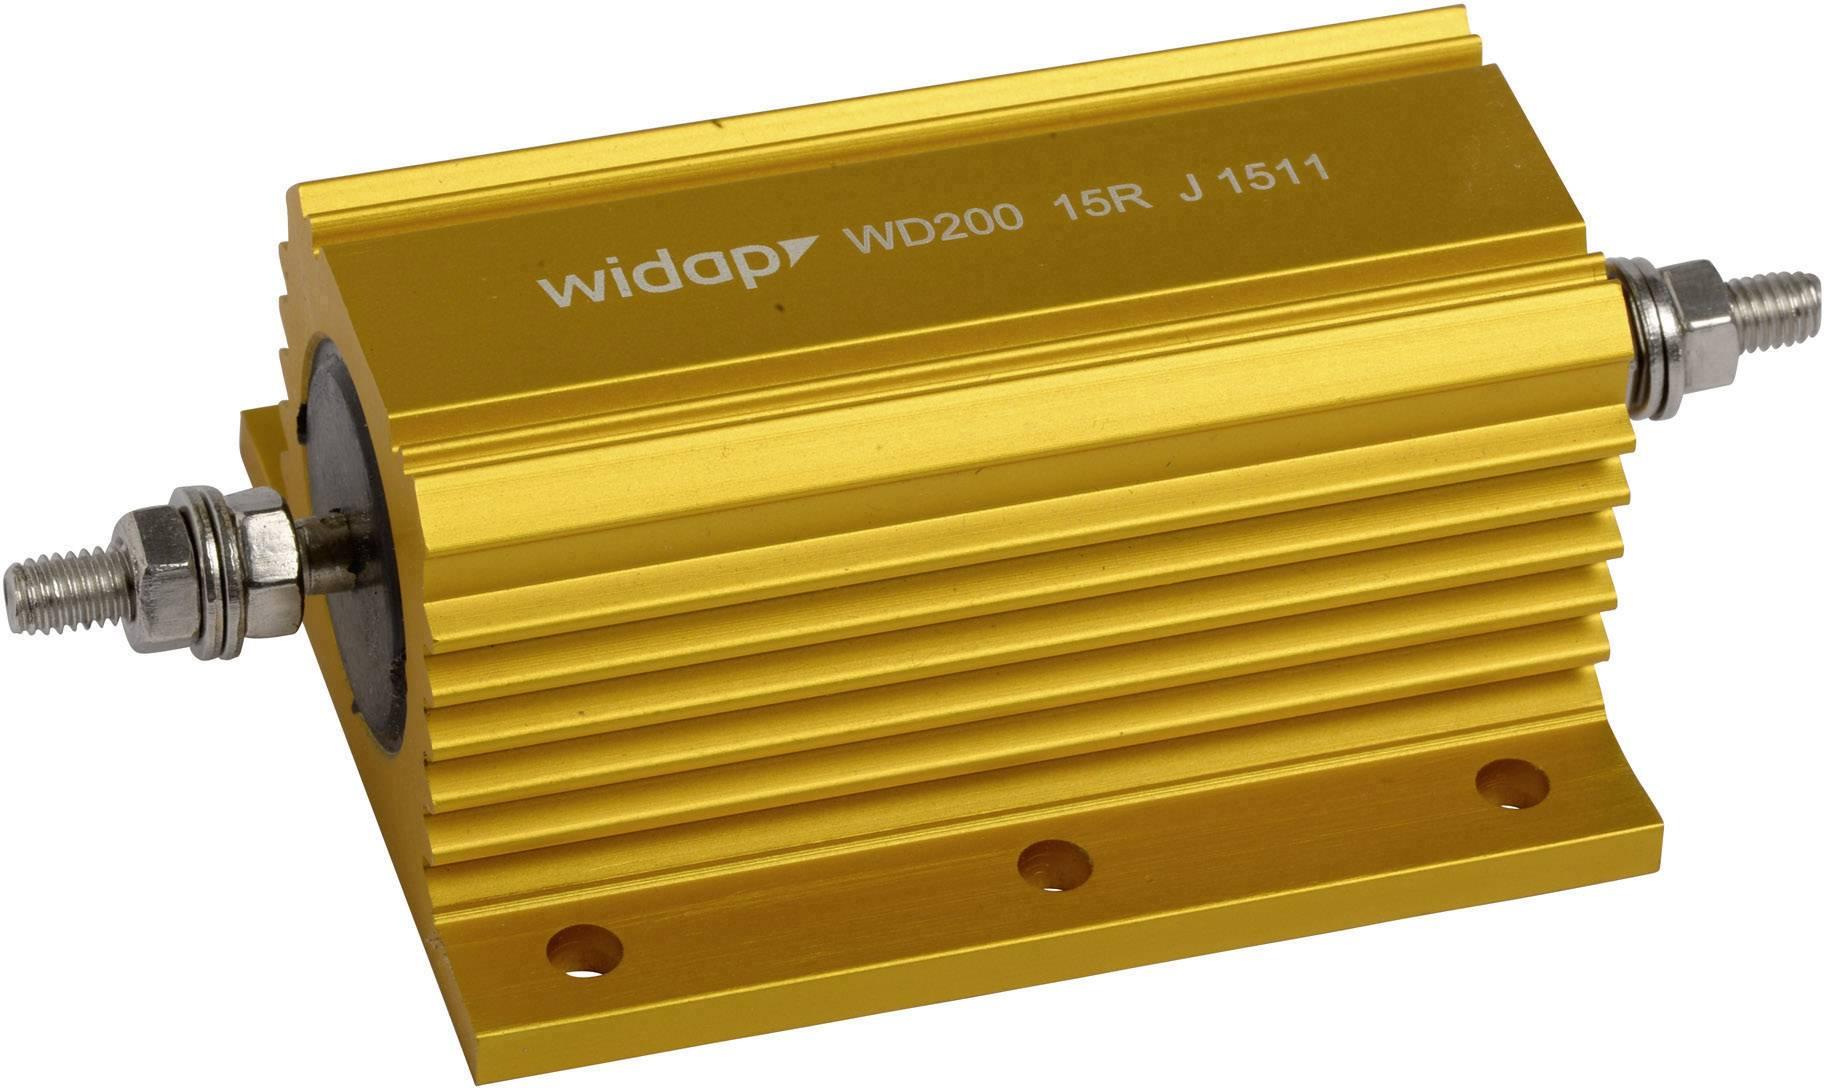 Drôtový rezistor Widap 160178, hodnota odporu 68 Ohm, 300 W, 1 ks